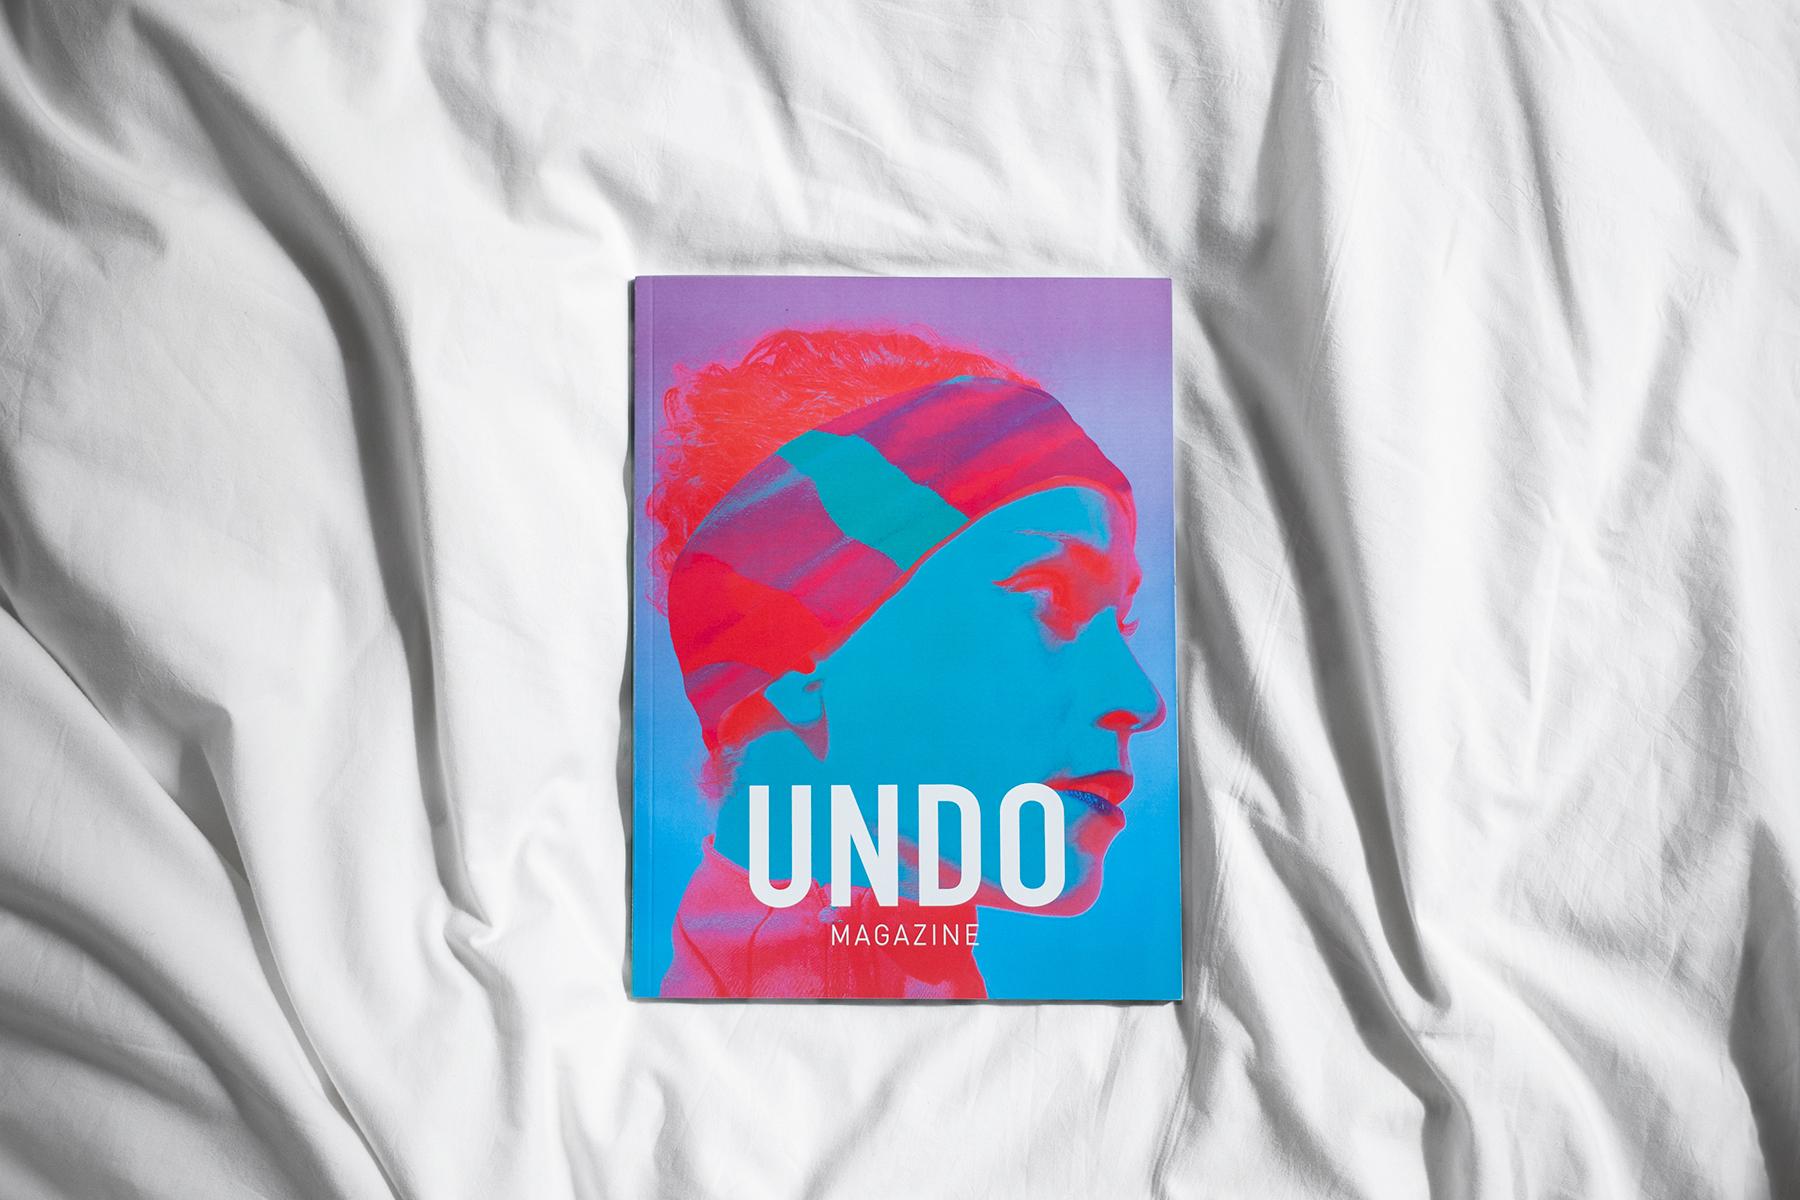 UNDO MAGAZINE Issue 01